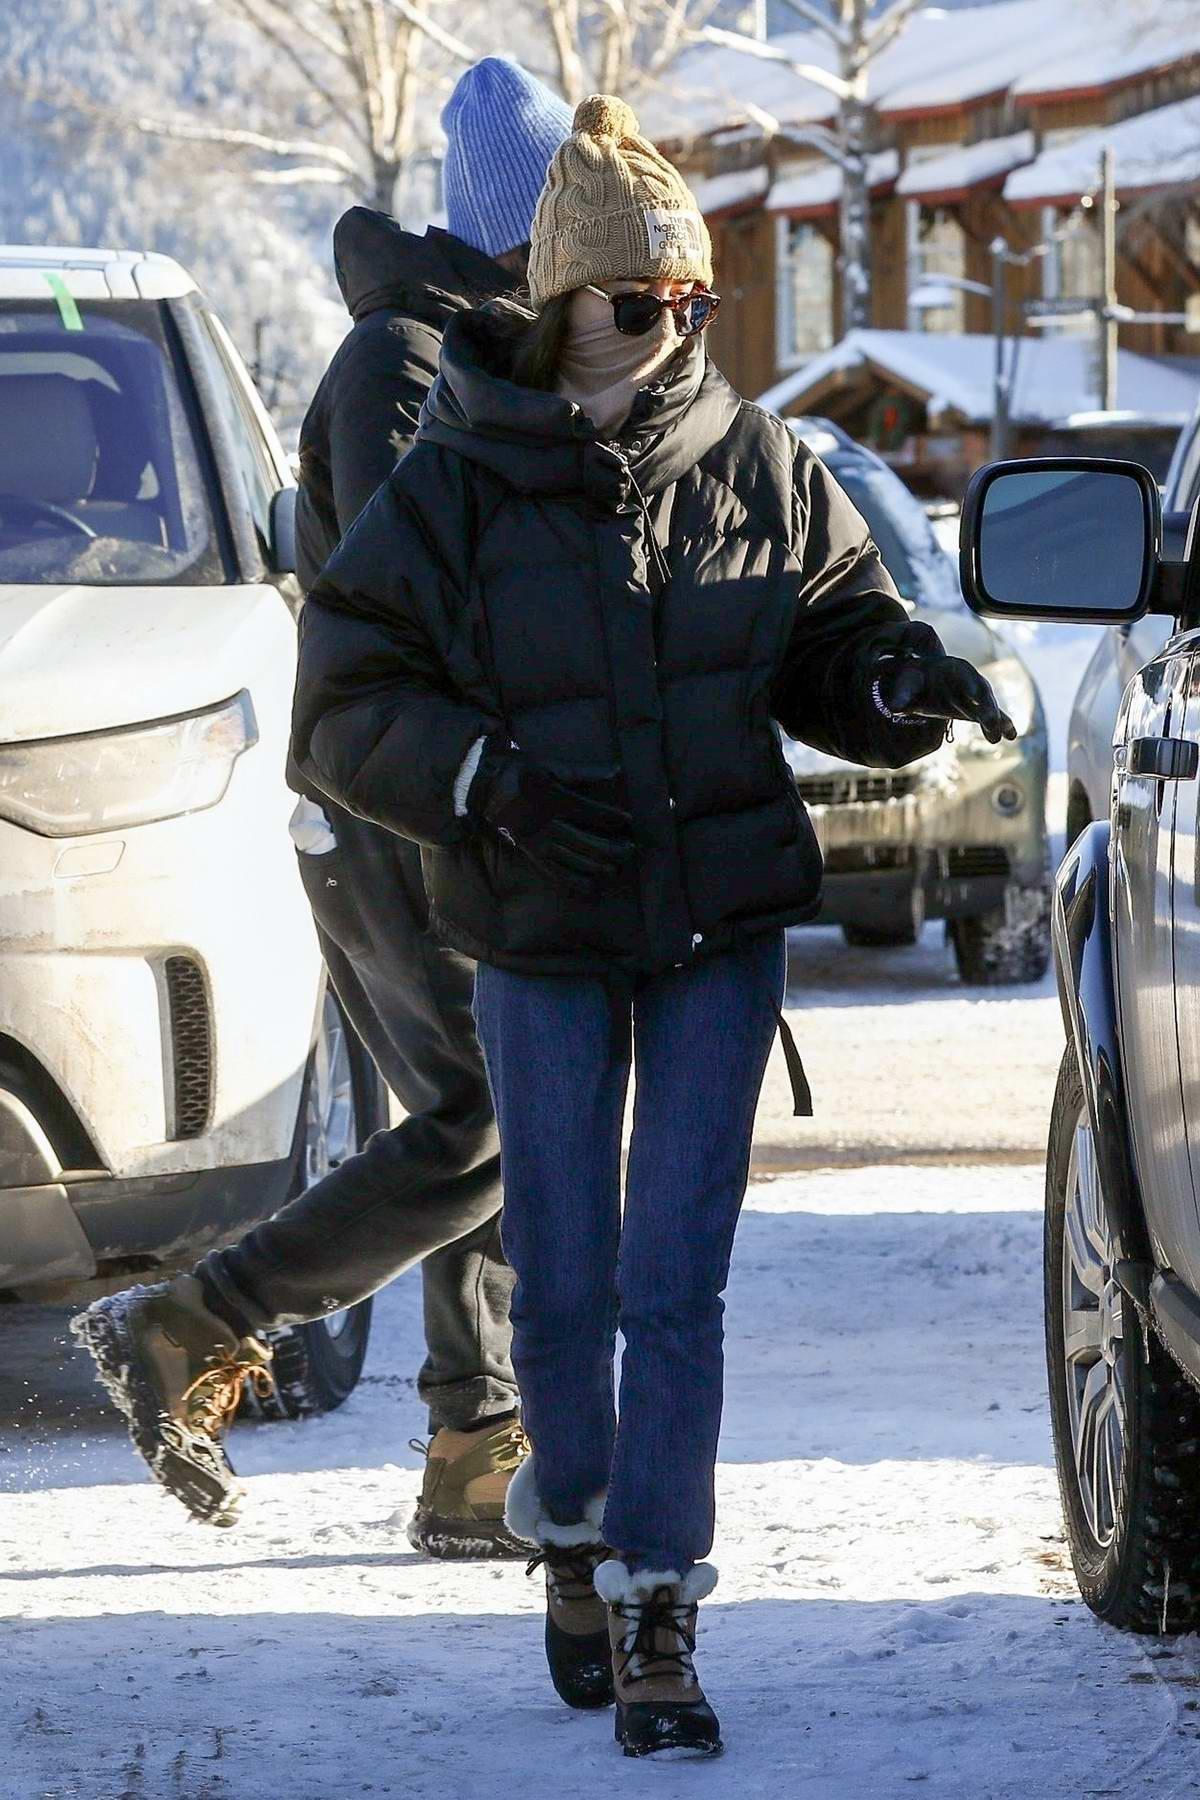 Dakota Johnson and Chris Martin visit Buttermilk Ski Area during their holiday stay in Aspen, Colorado